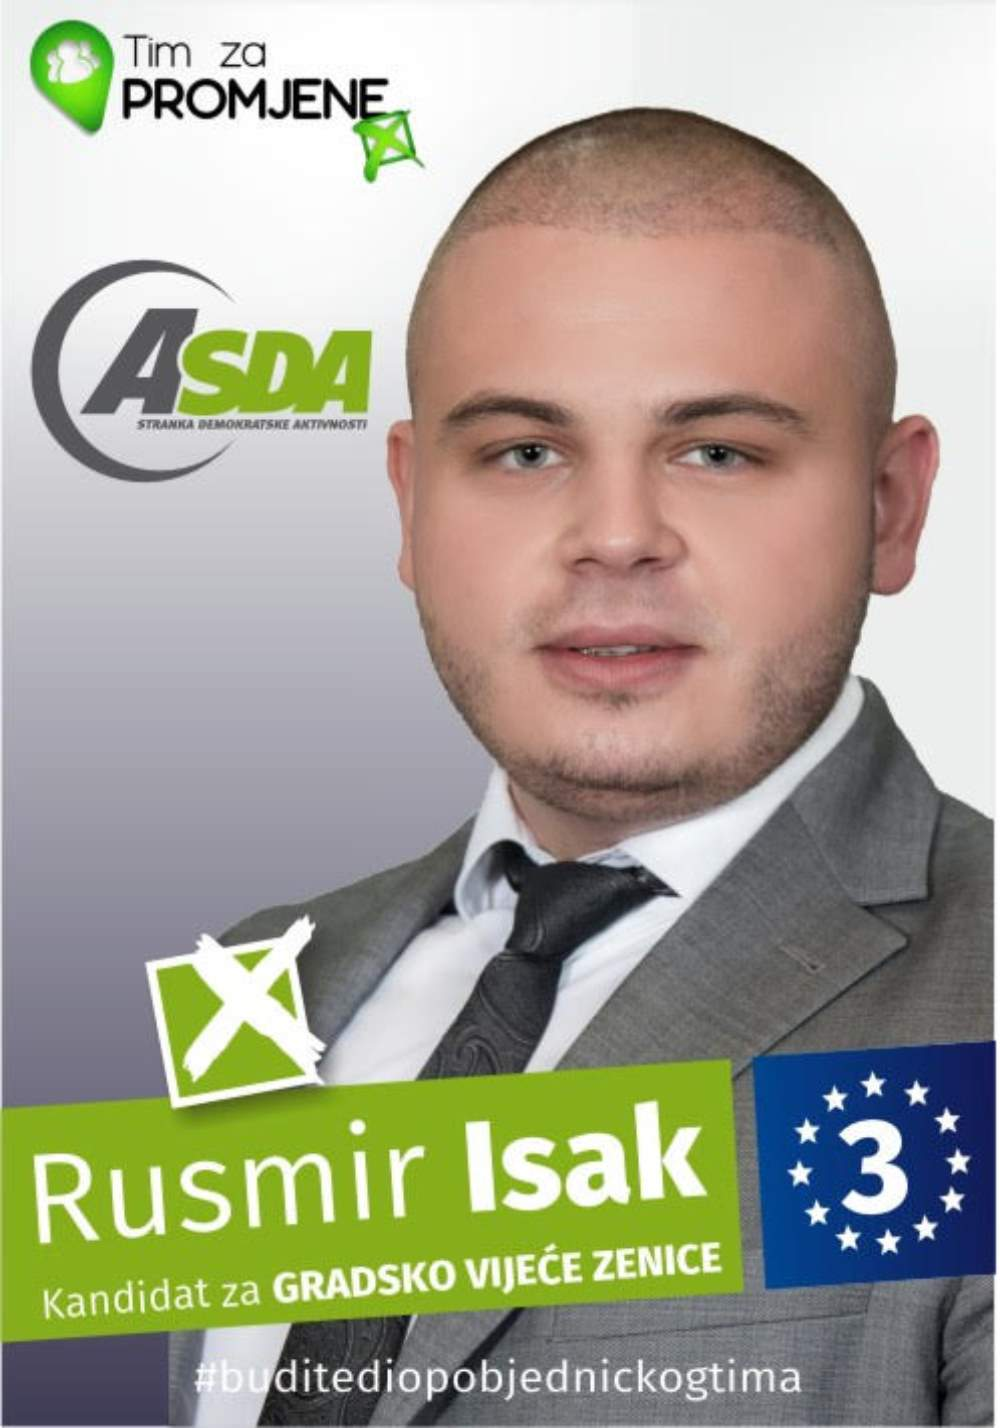 Rusmir Isak